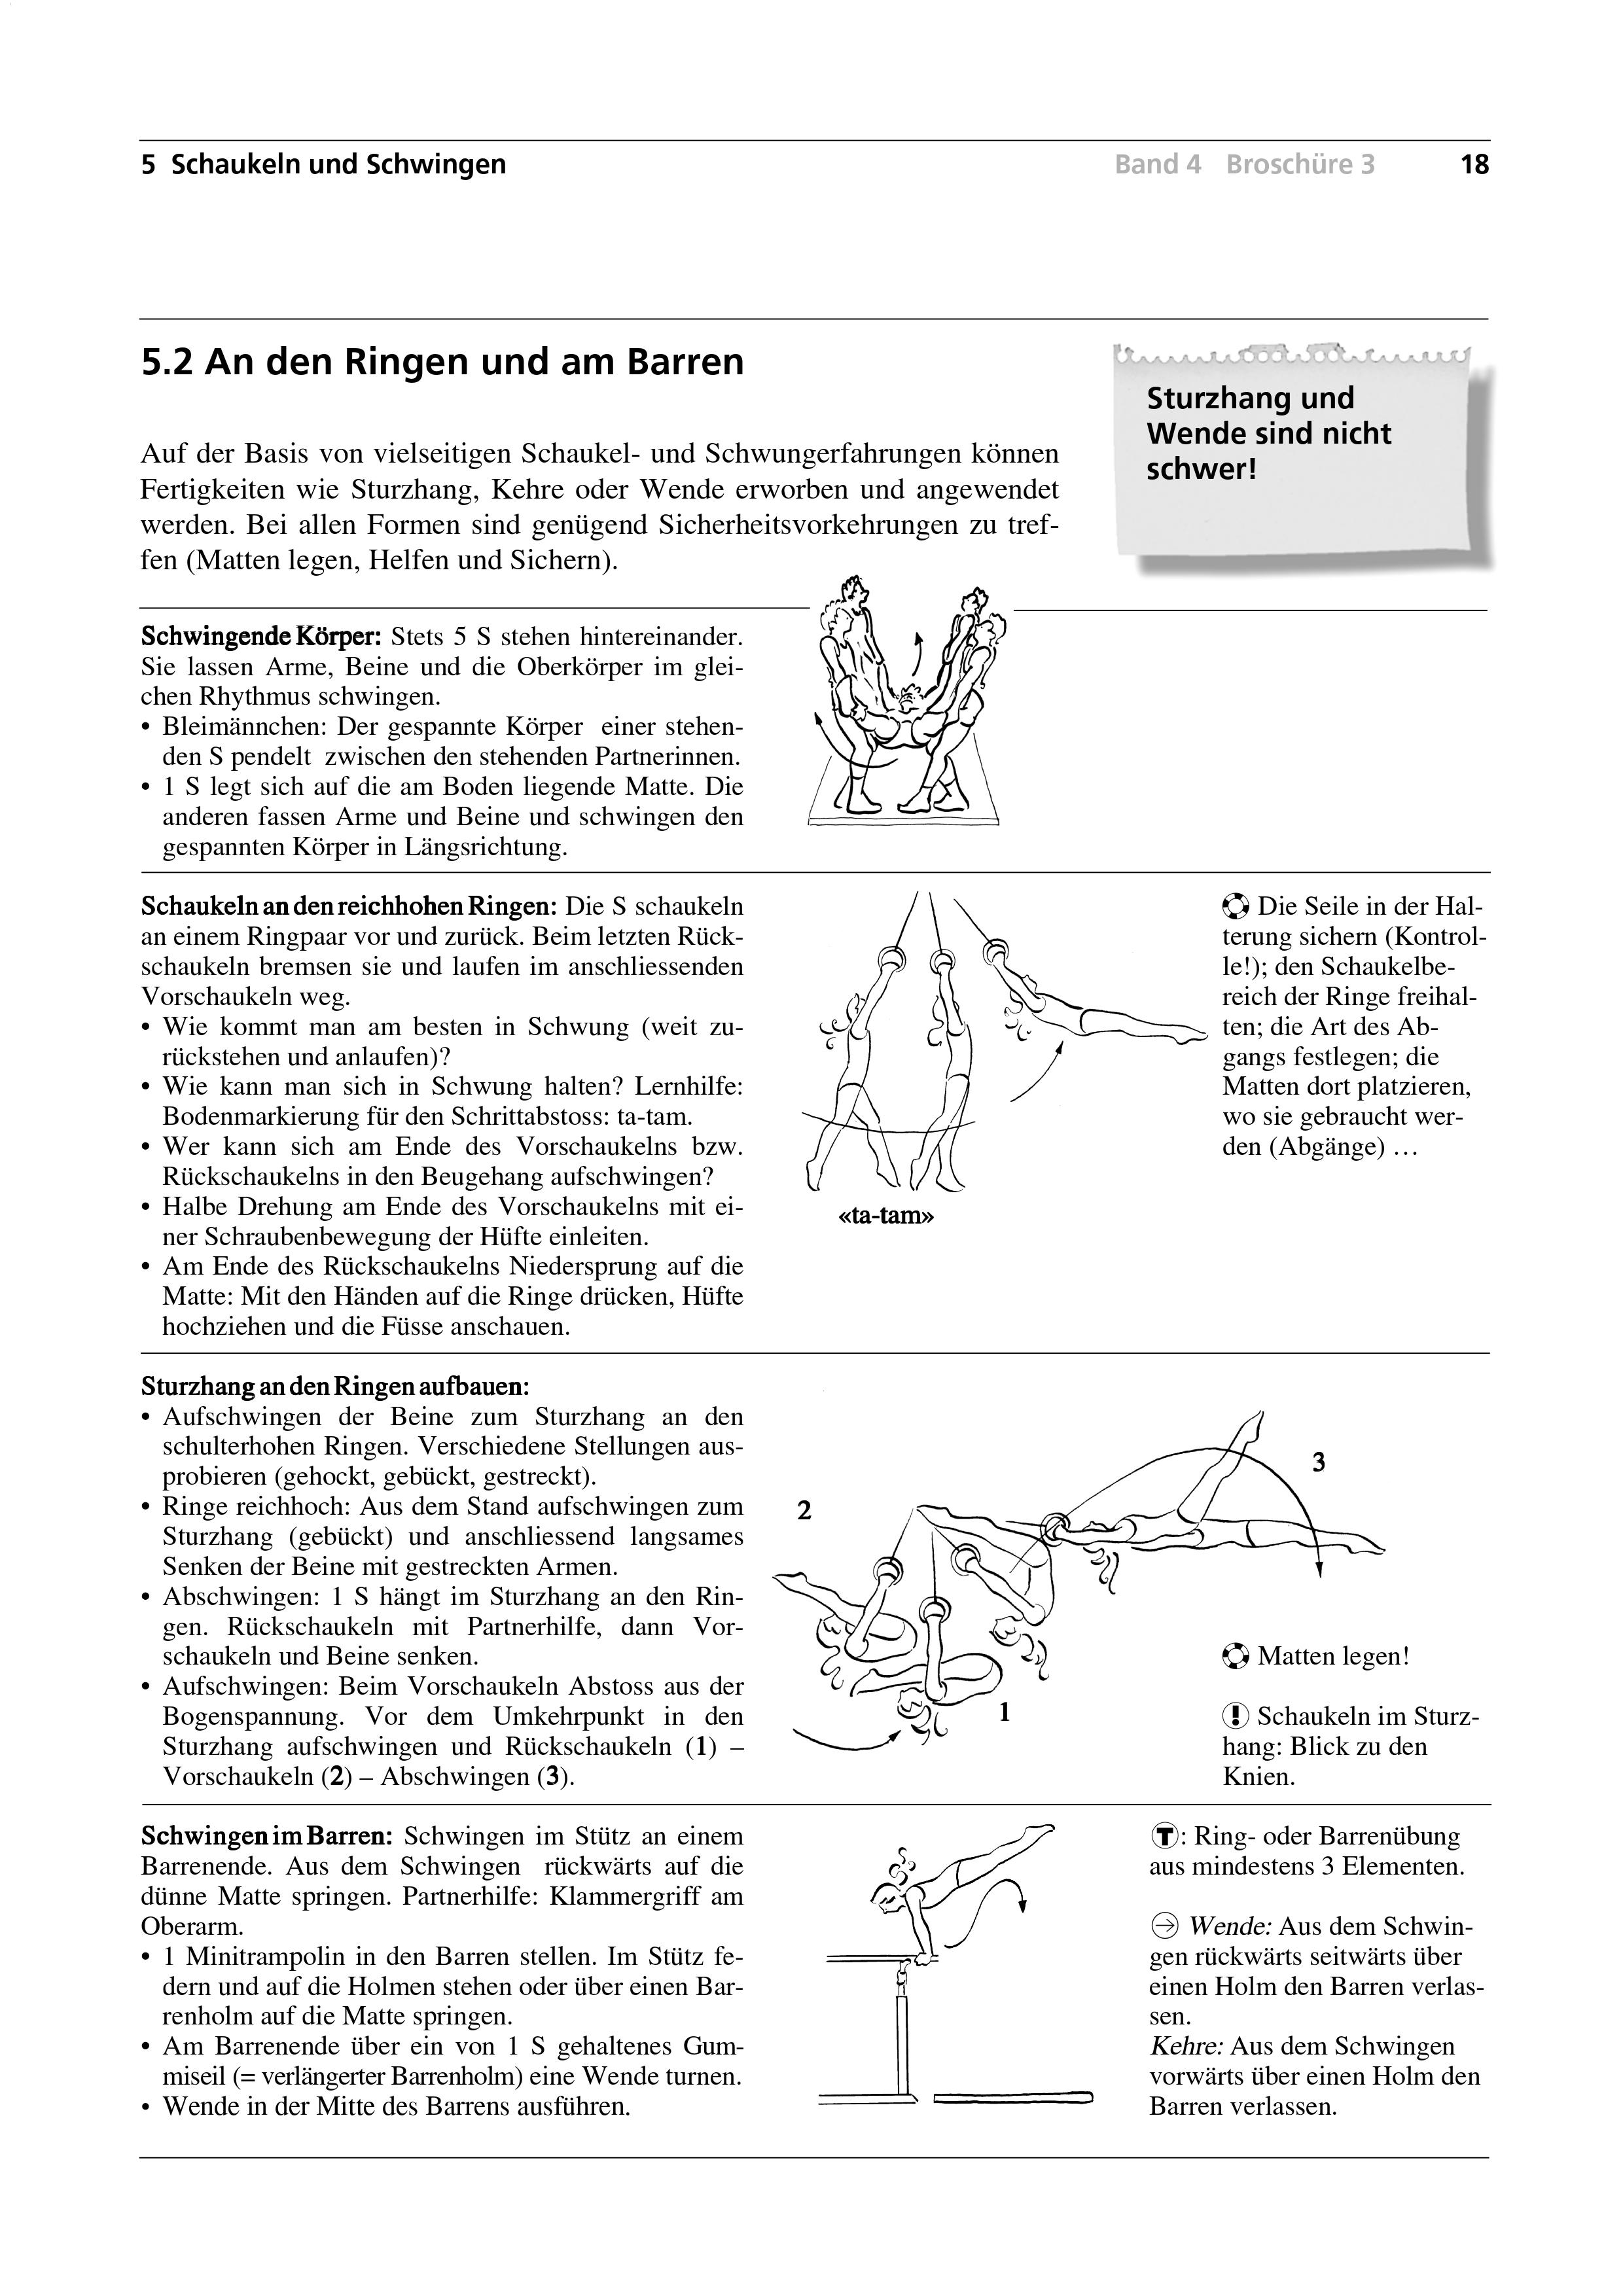 Preview image for LOM object An den Ringen und am Barren